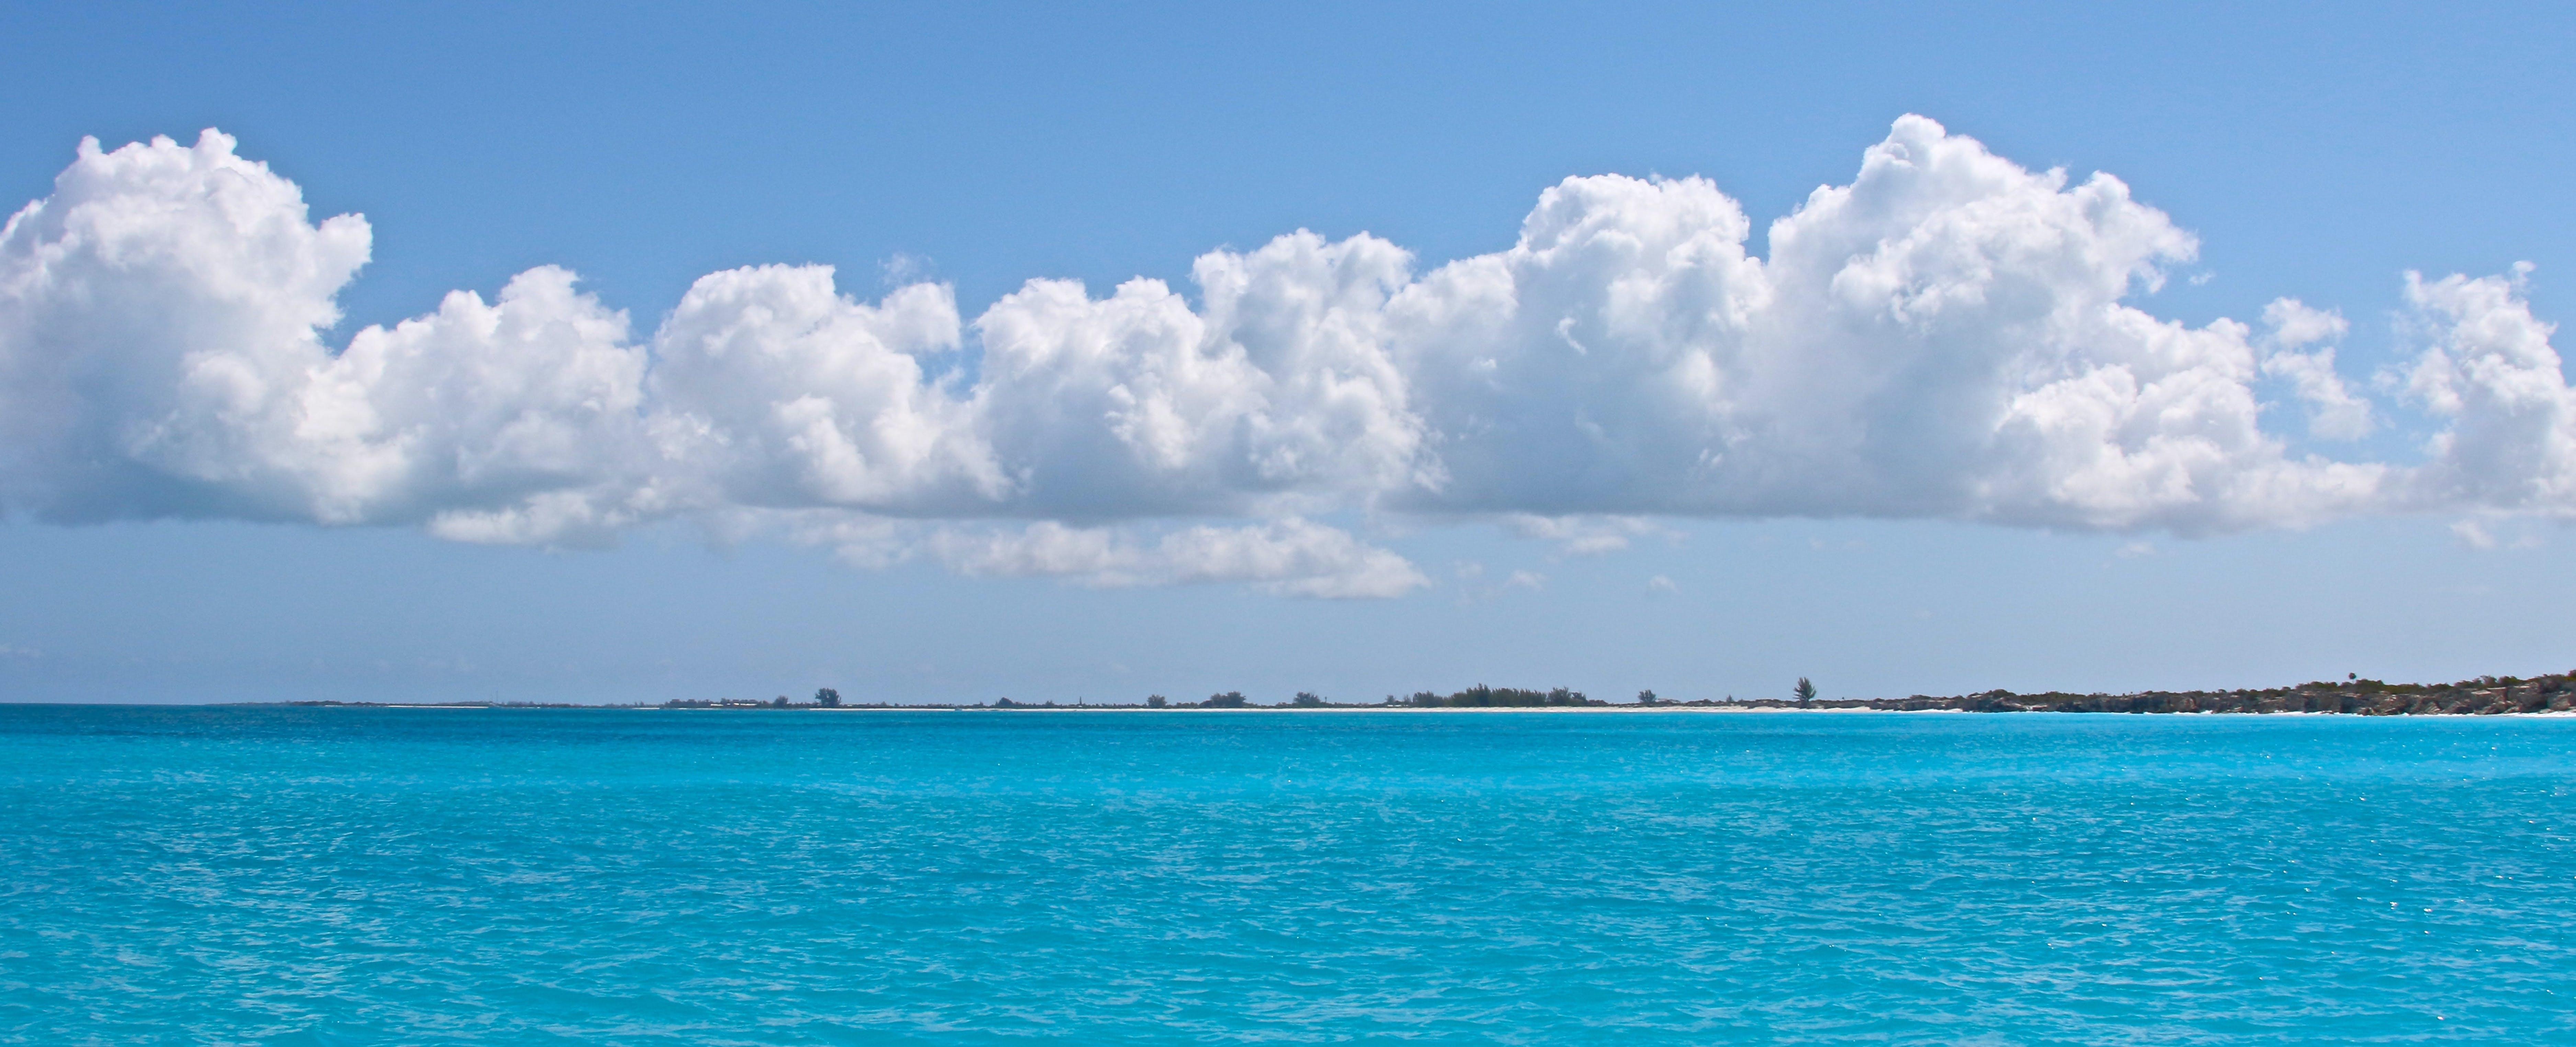 Free stock photo of beach, kiteboarding, kitesurfing, ocean